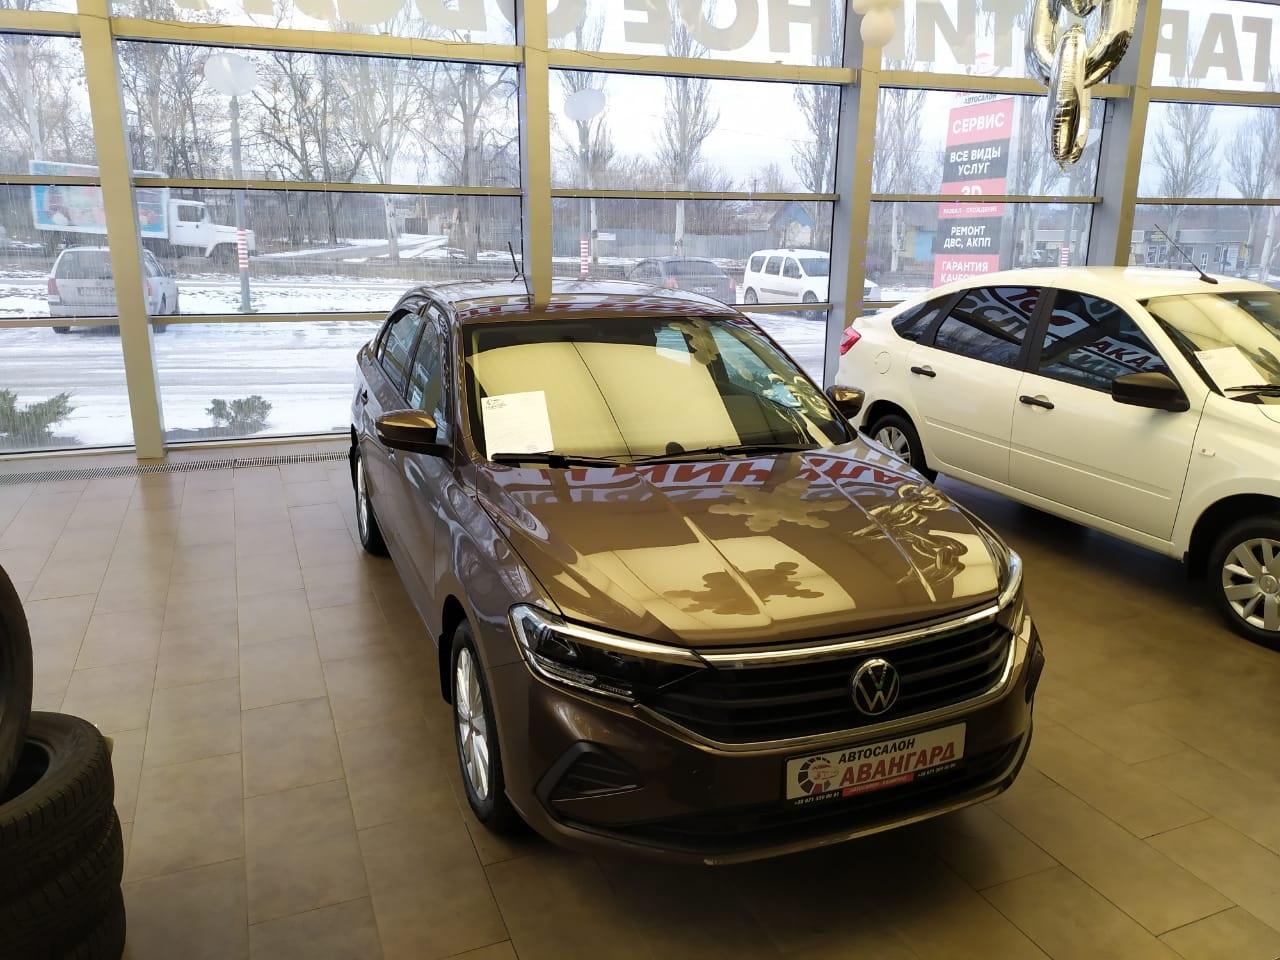 Volkswagen Polo лифтбек 1.6 л., 16-кл., (110л.с.) 5МТ. Status. Коричневый Toffee